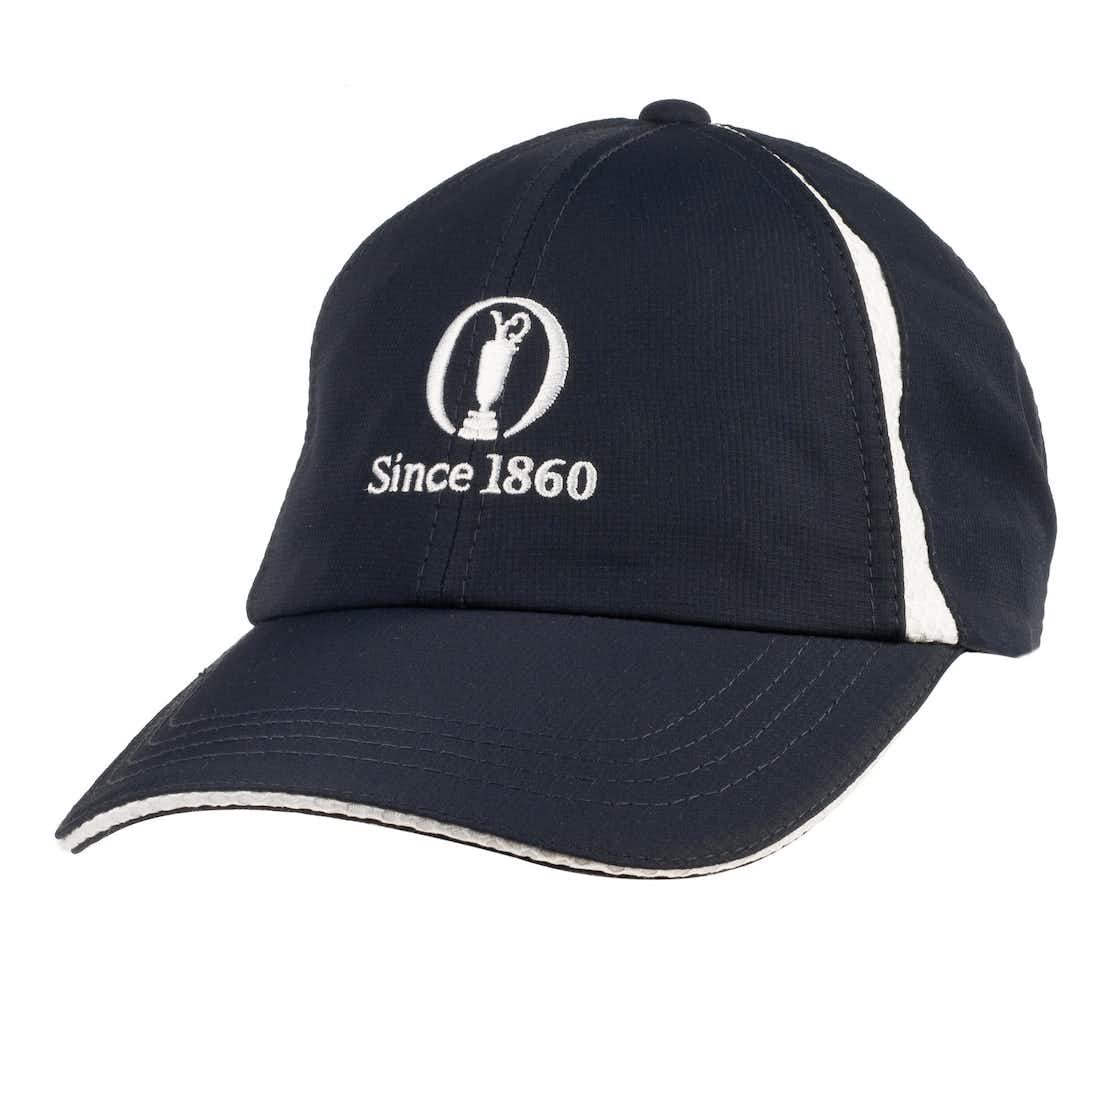 Heritage Since 1860 Baseball Cap - Blue